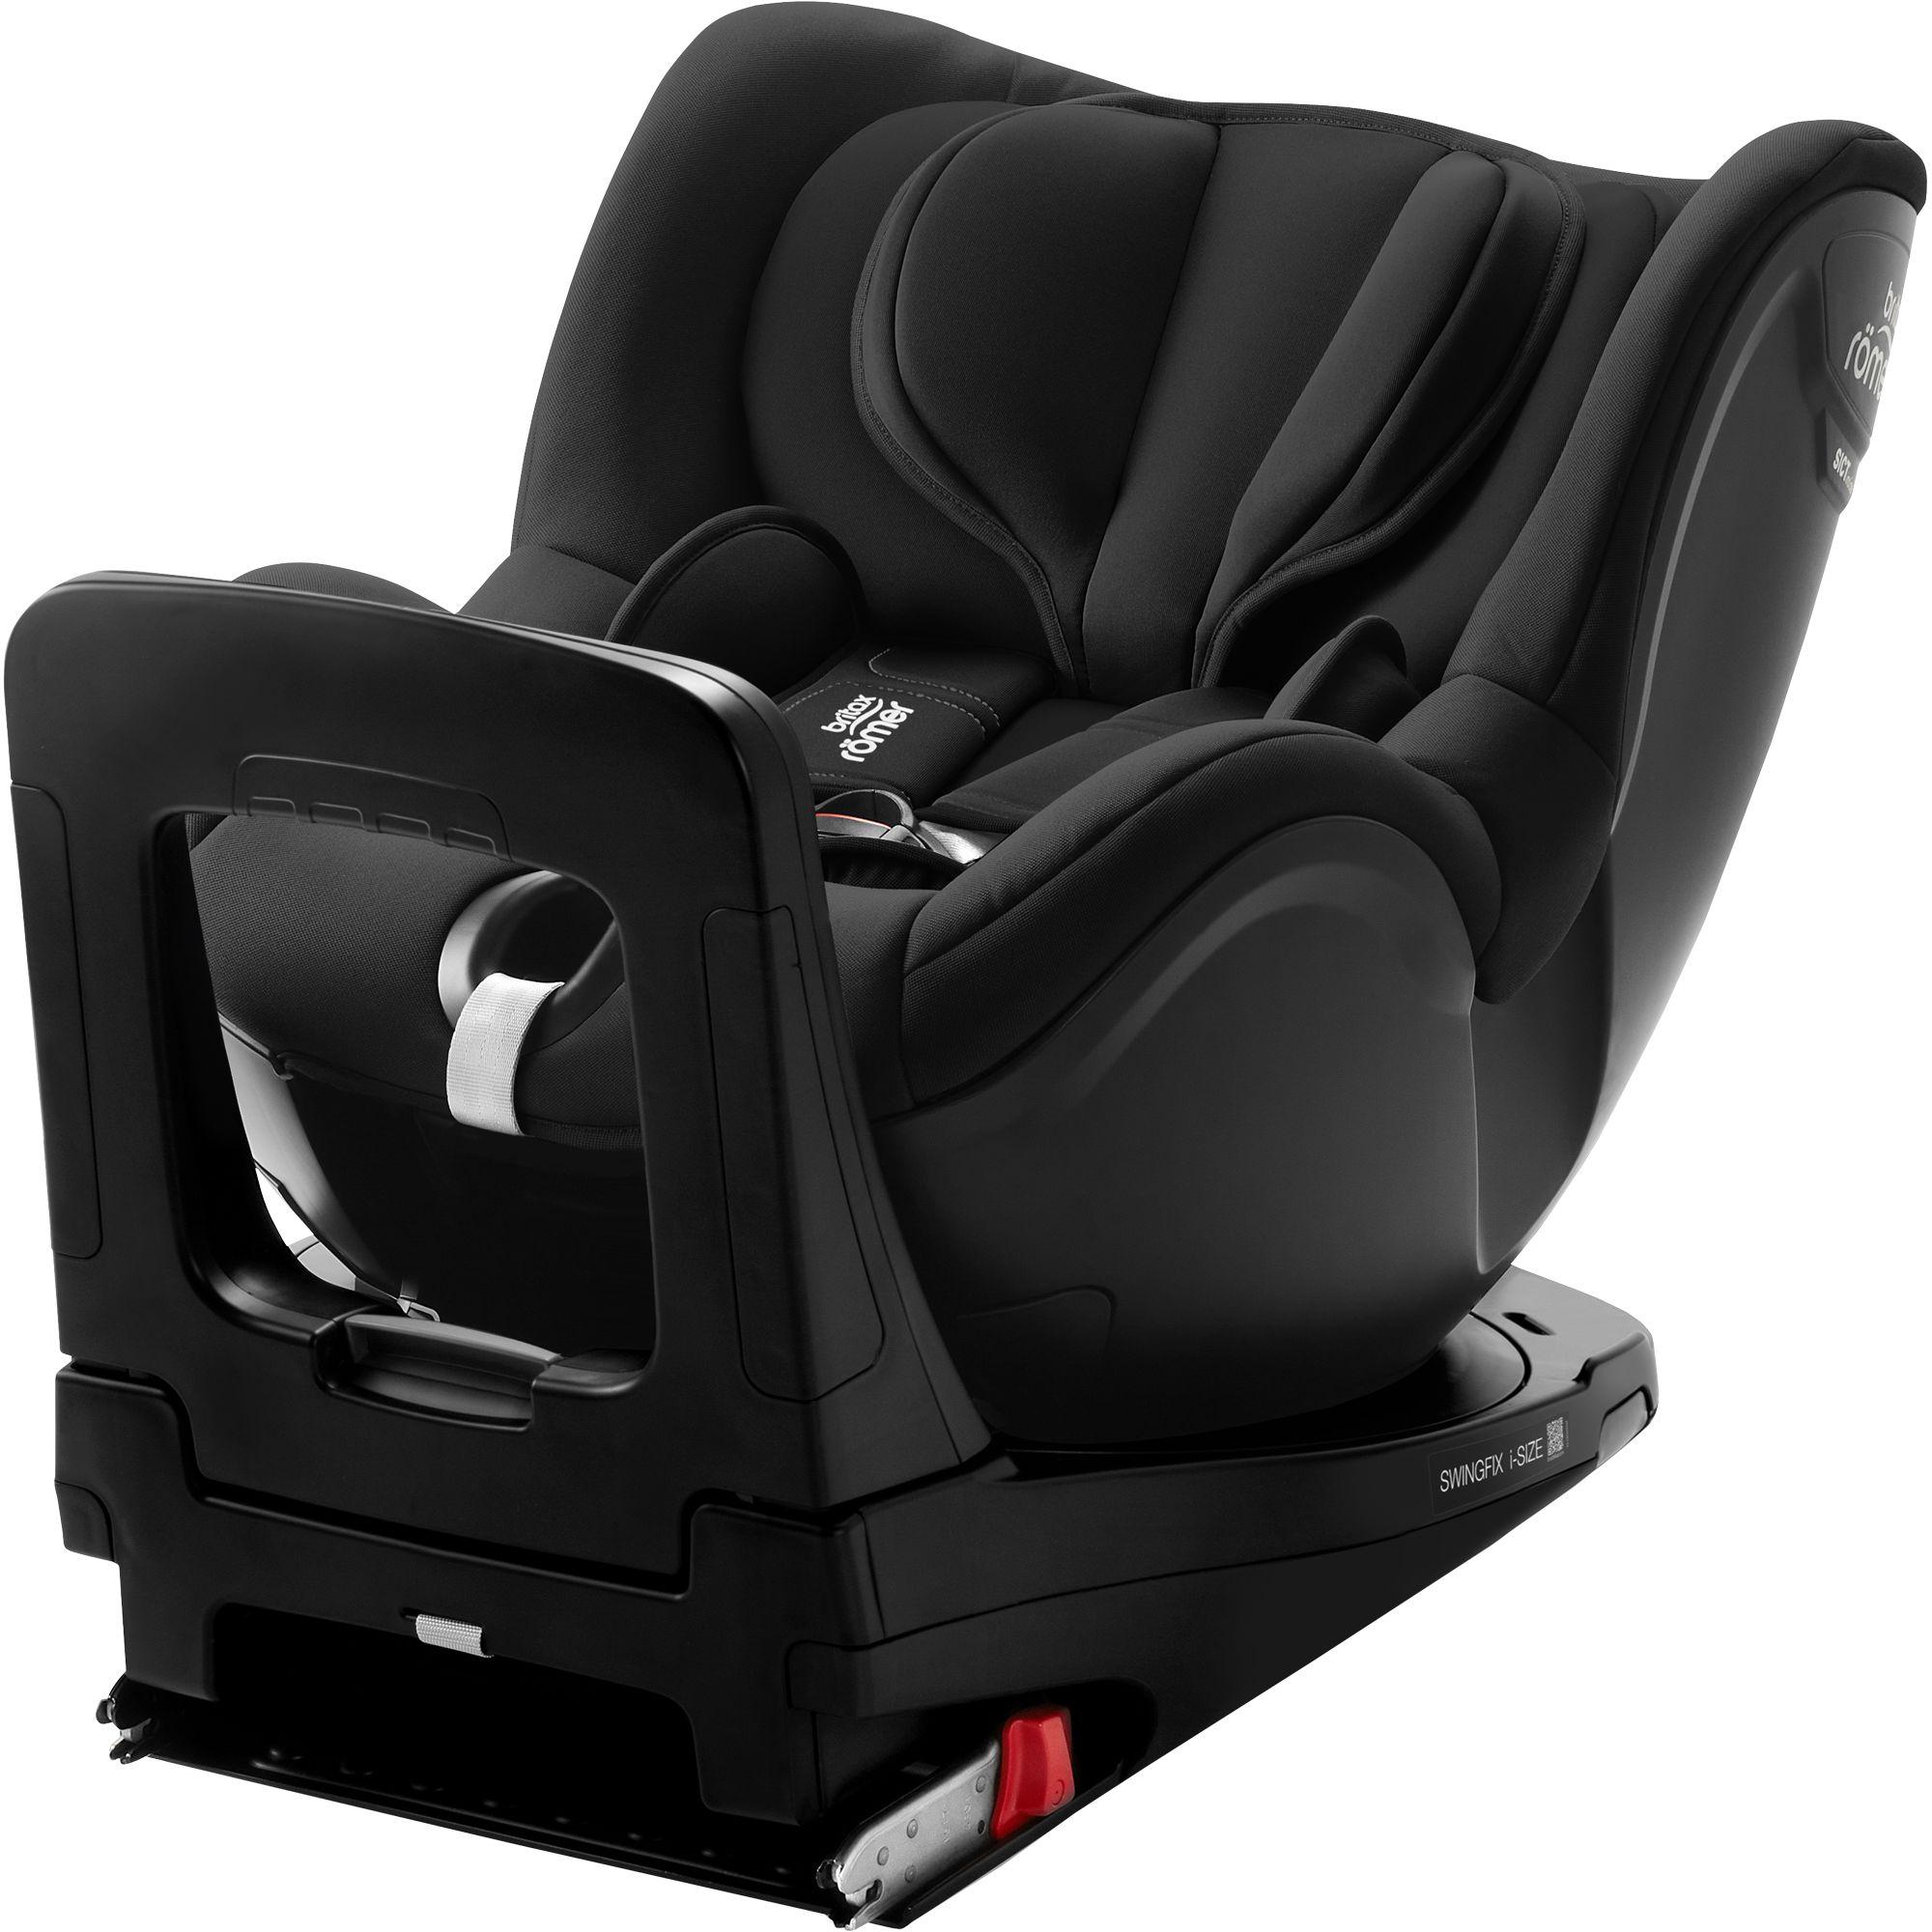 ROMER Swingfix i-Size Cosmos Black 2020